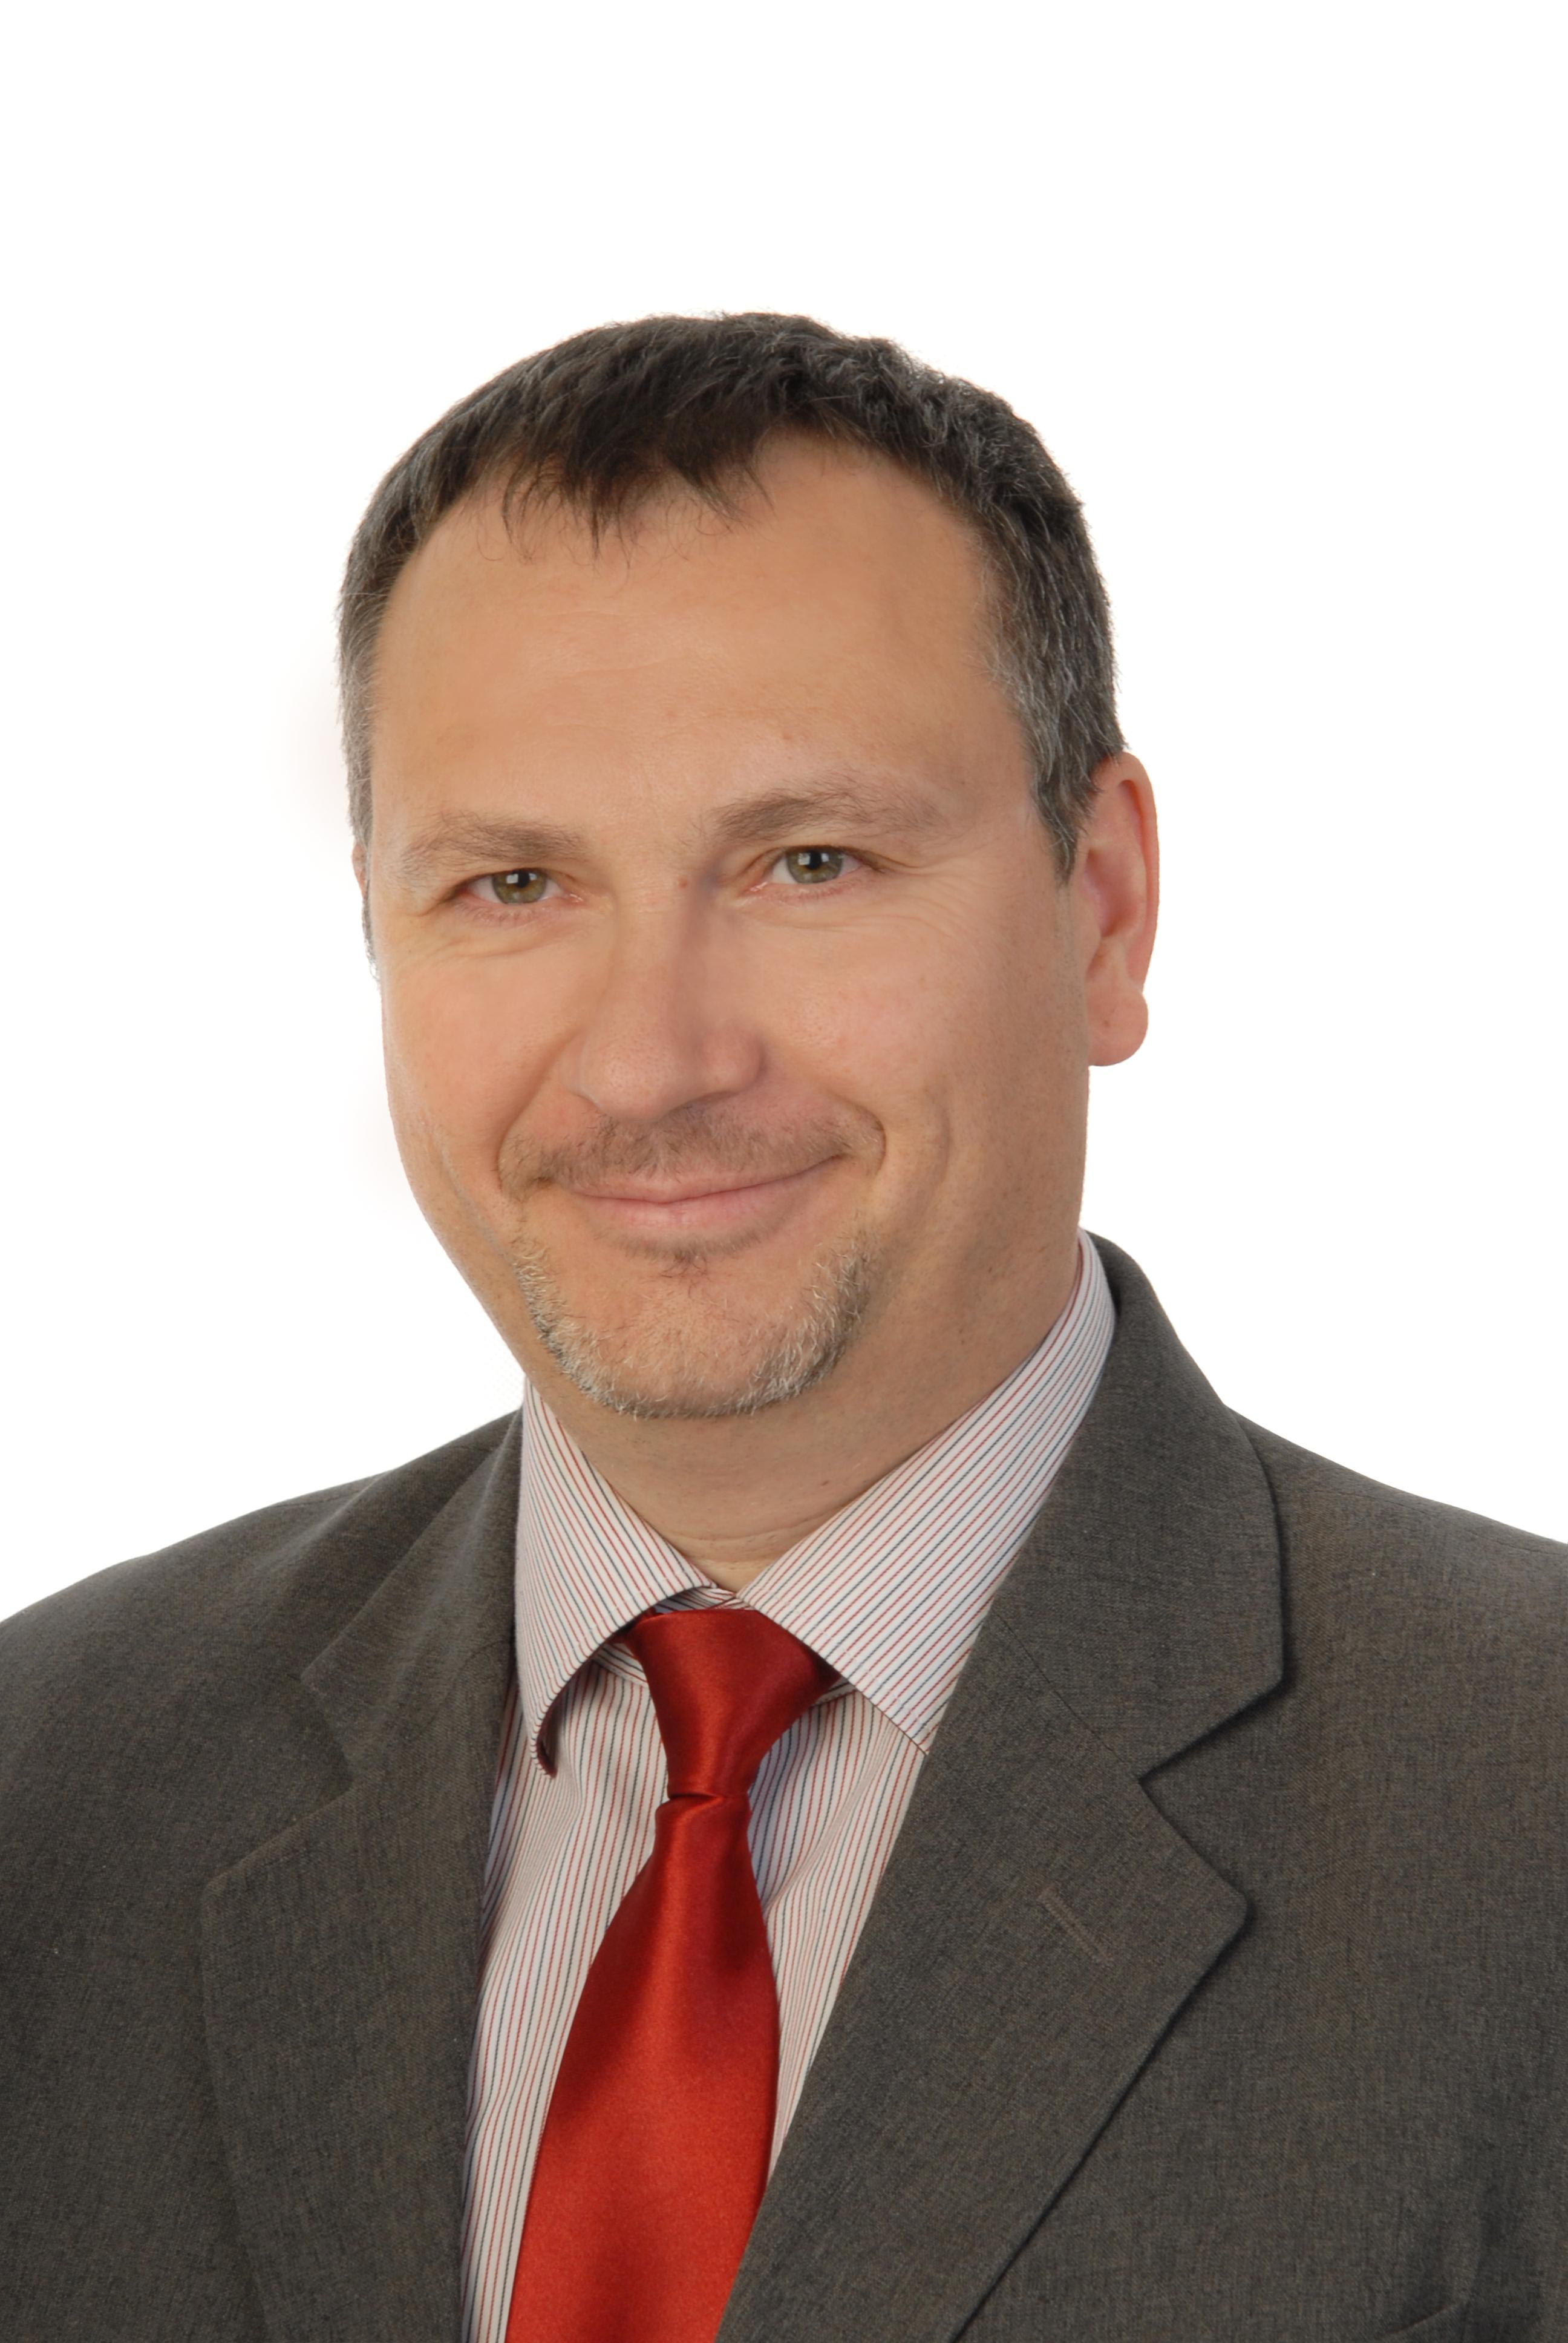 Andrzej Hawran